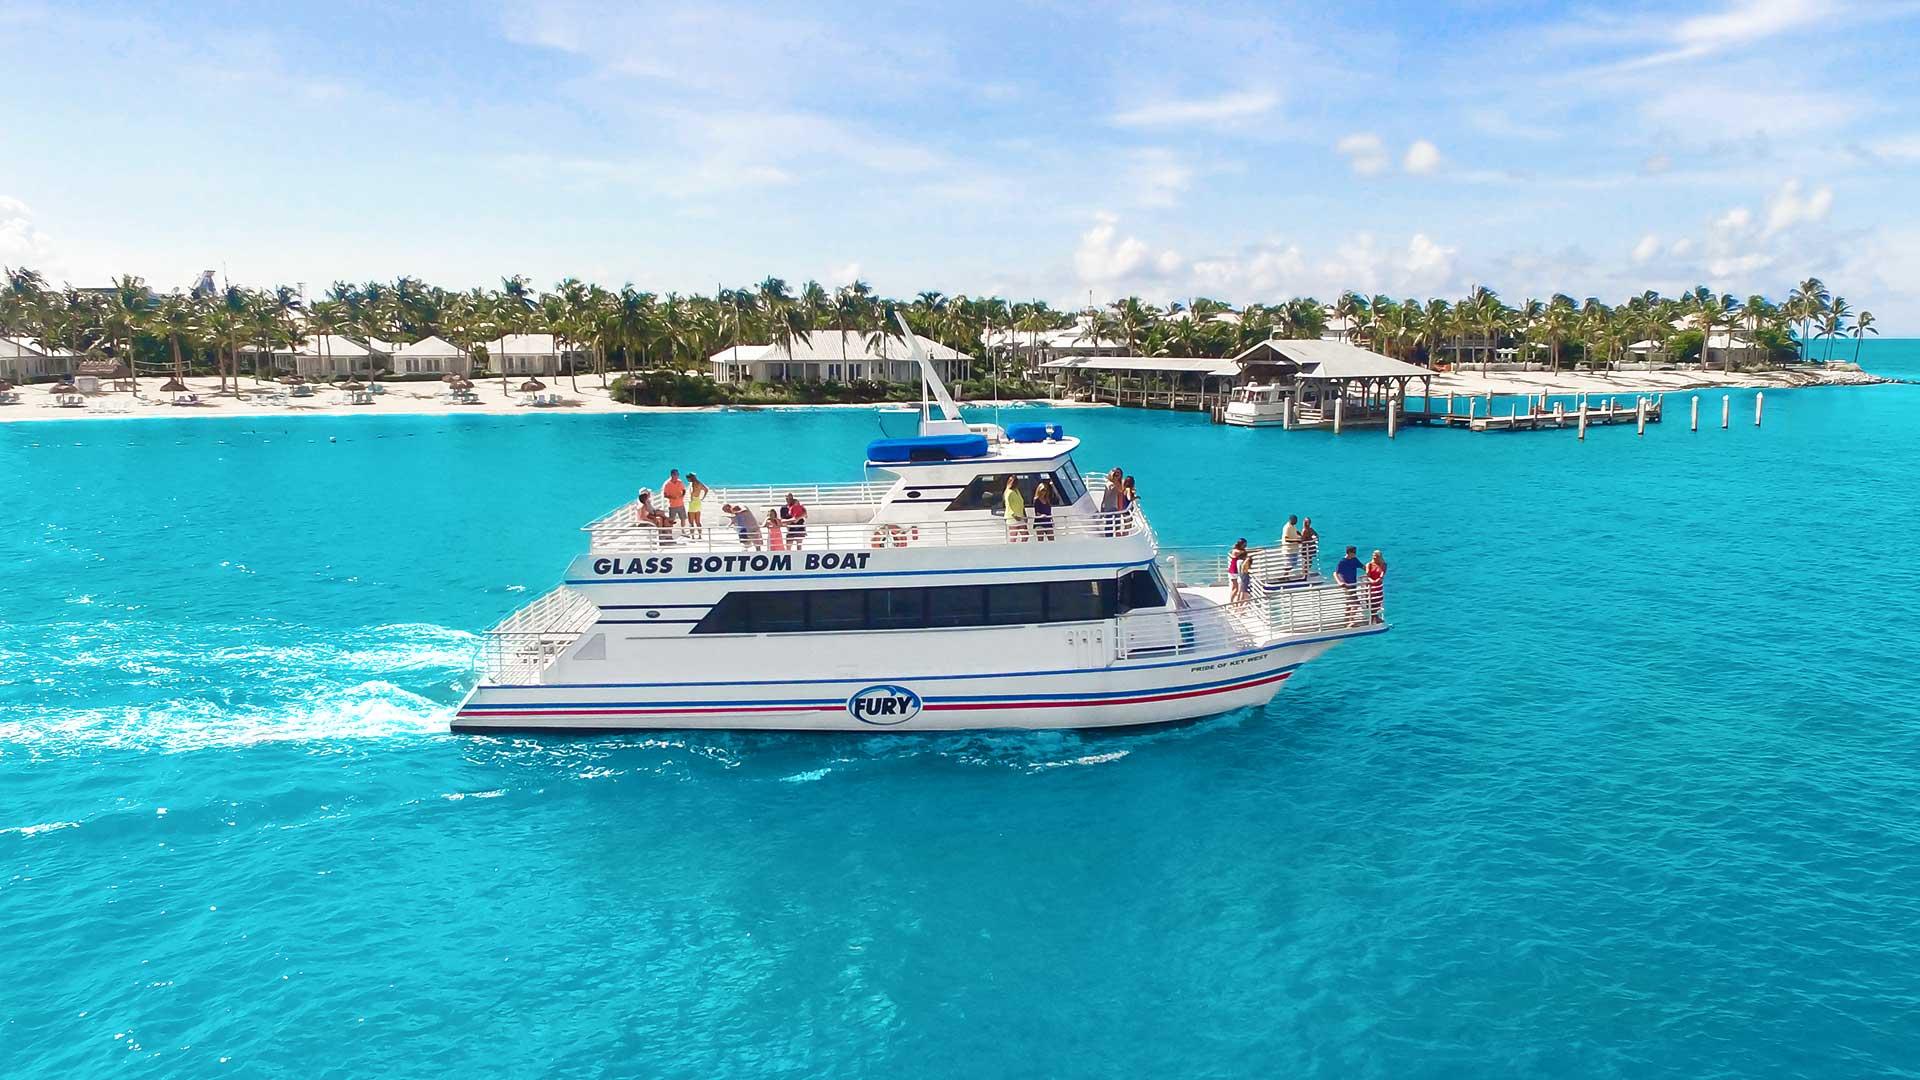 fury glass bottom boat blue water key west